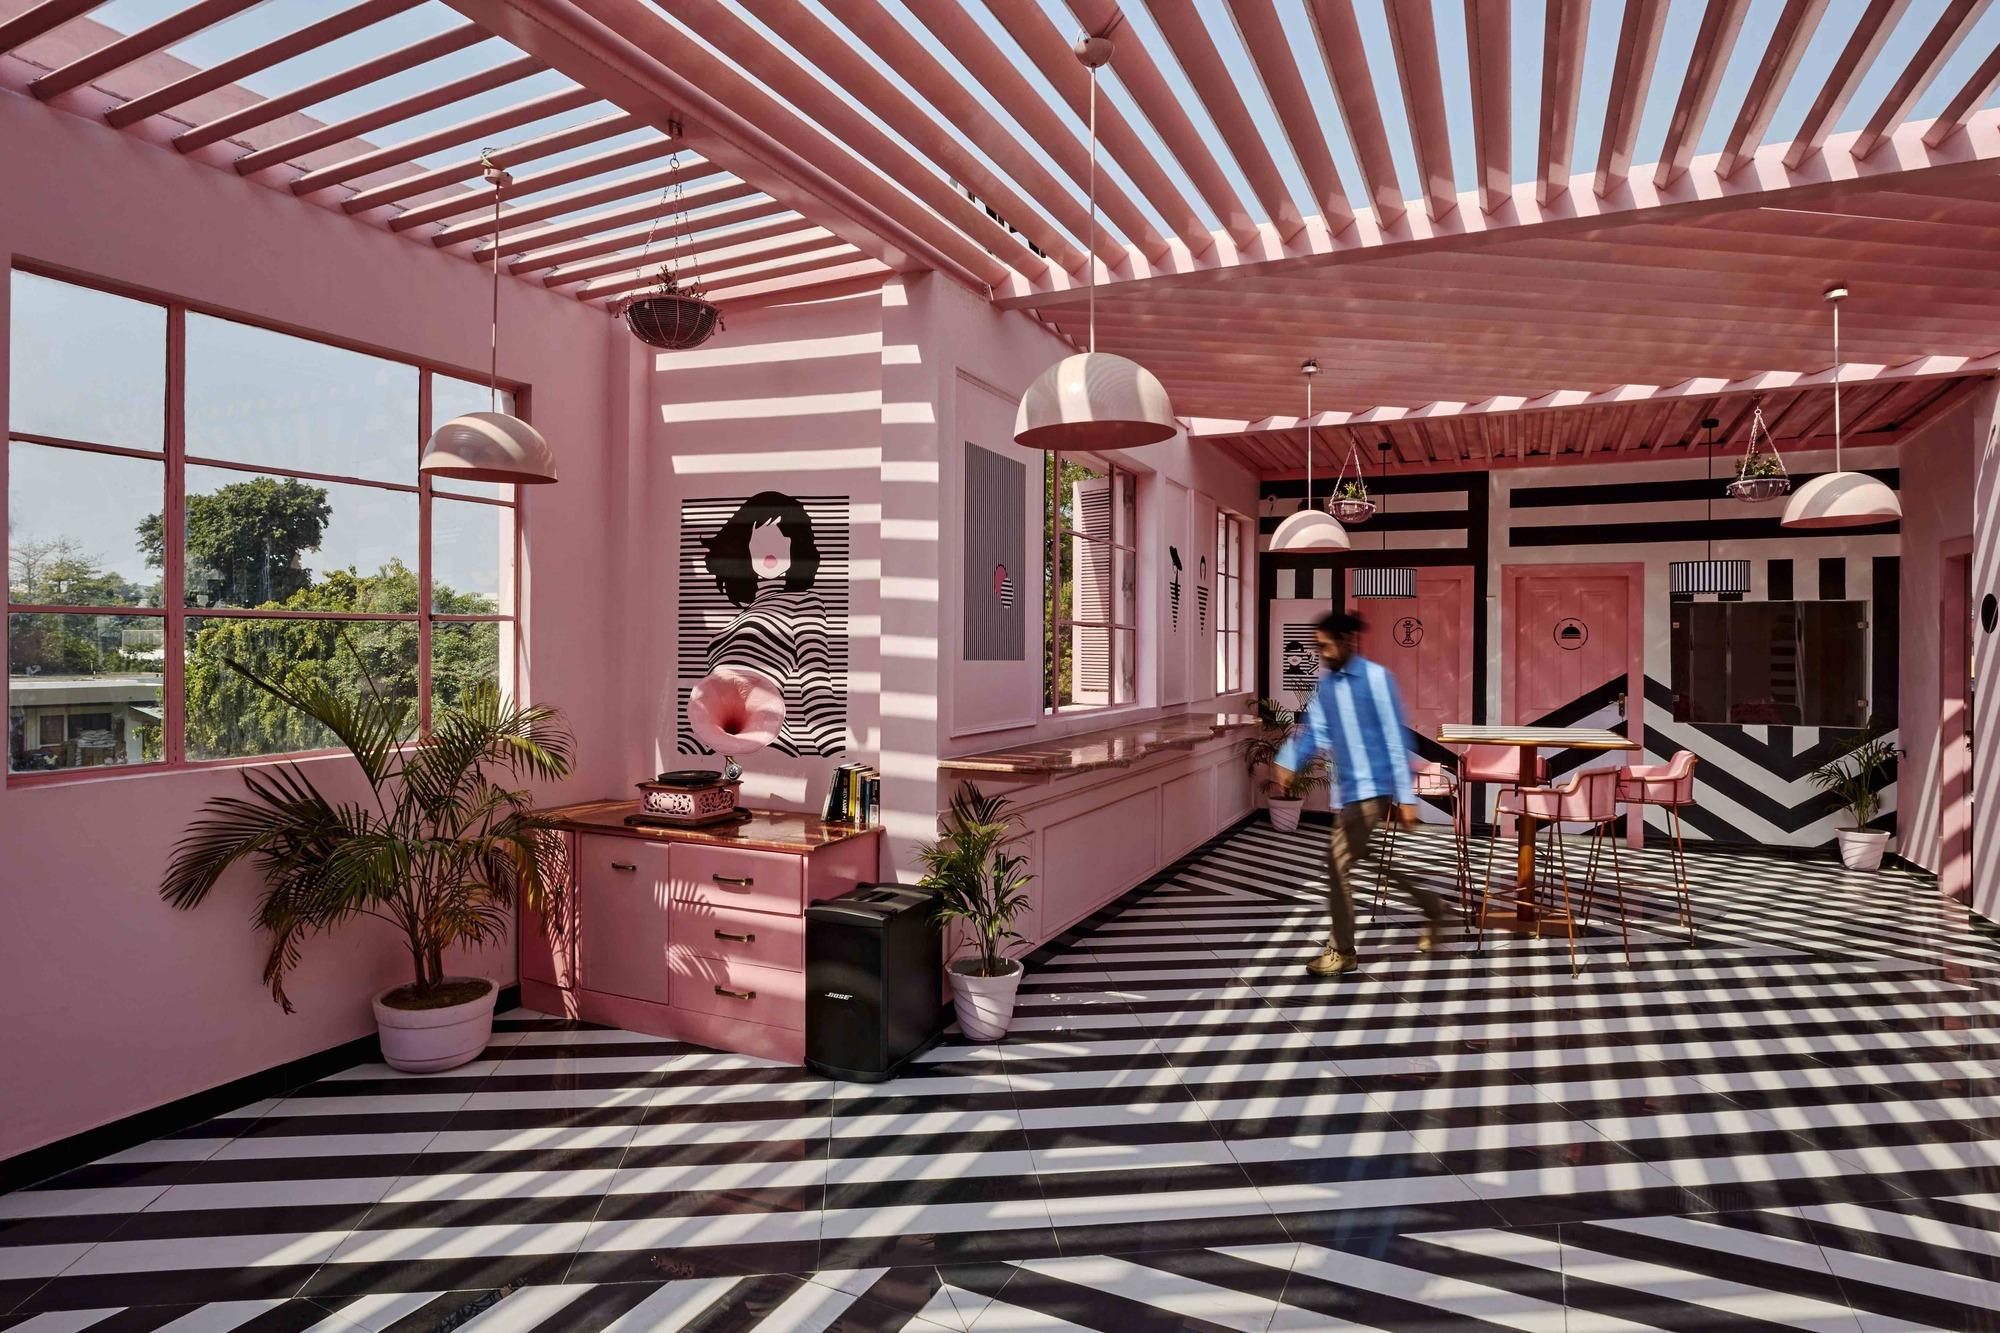 The Pink Zebra Restaurant Renesa Architecture Design Interiors Studio Archdaily